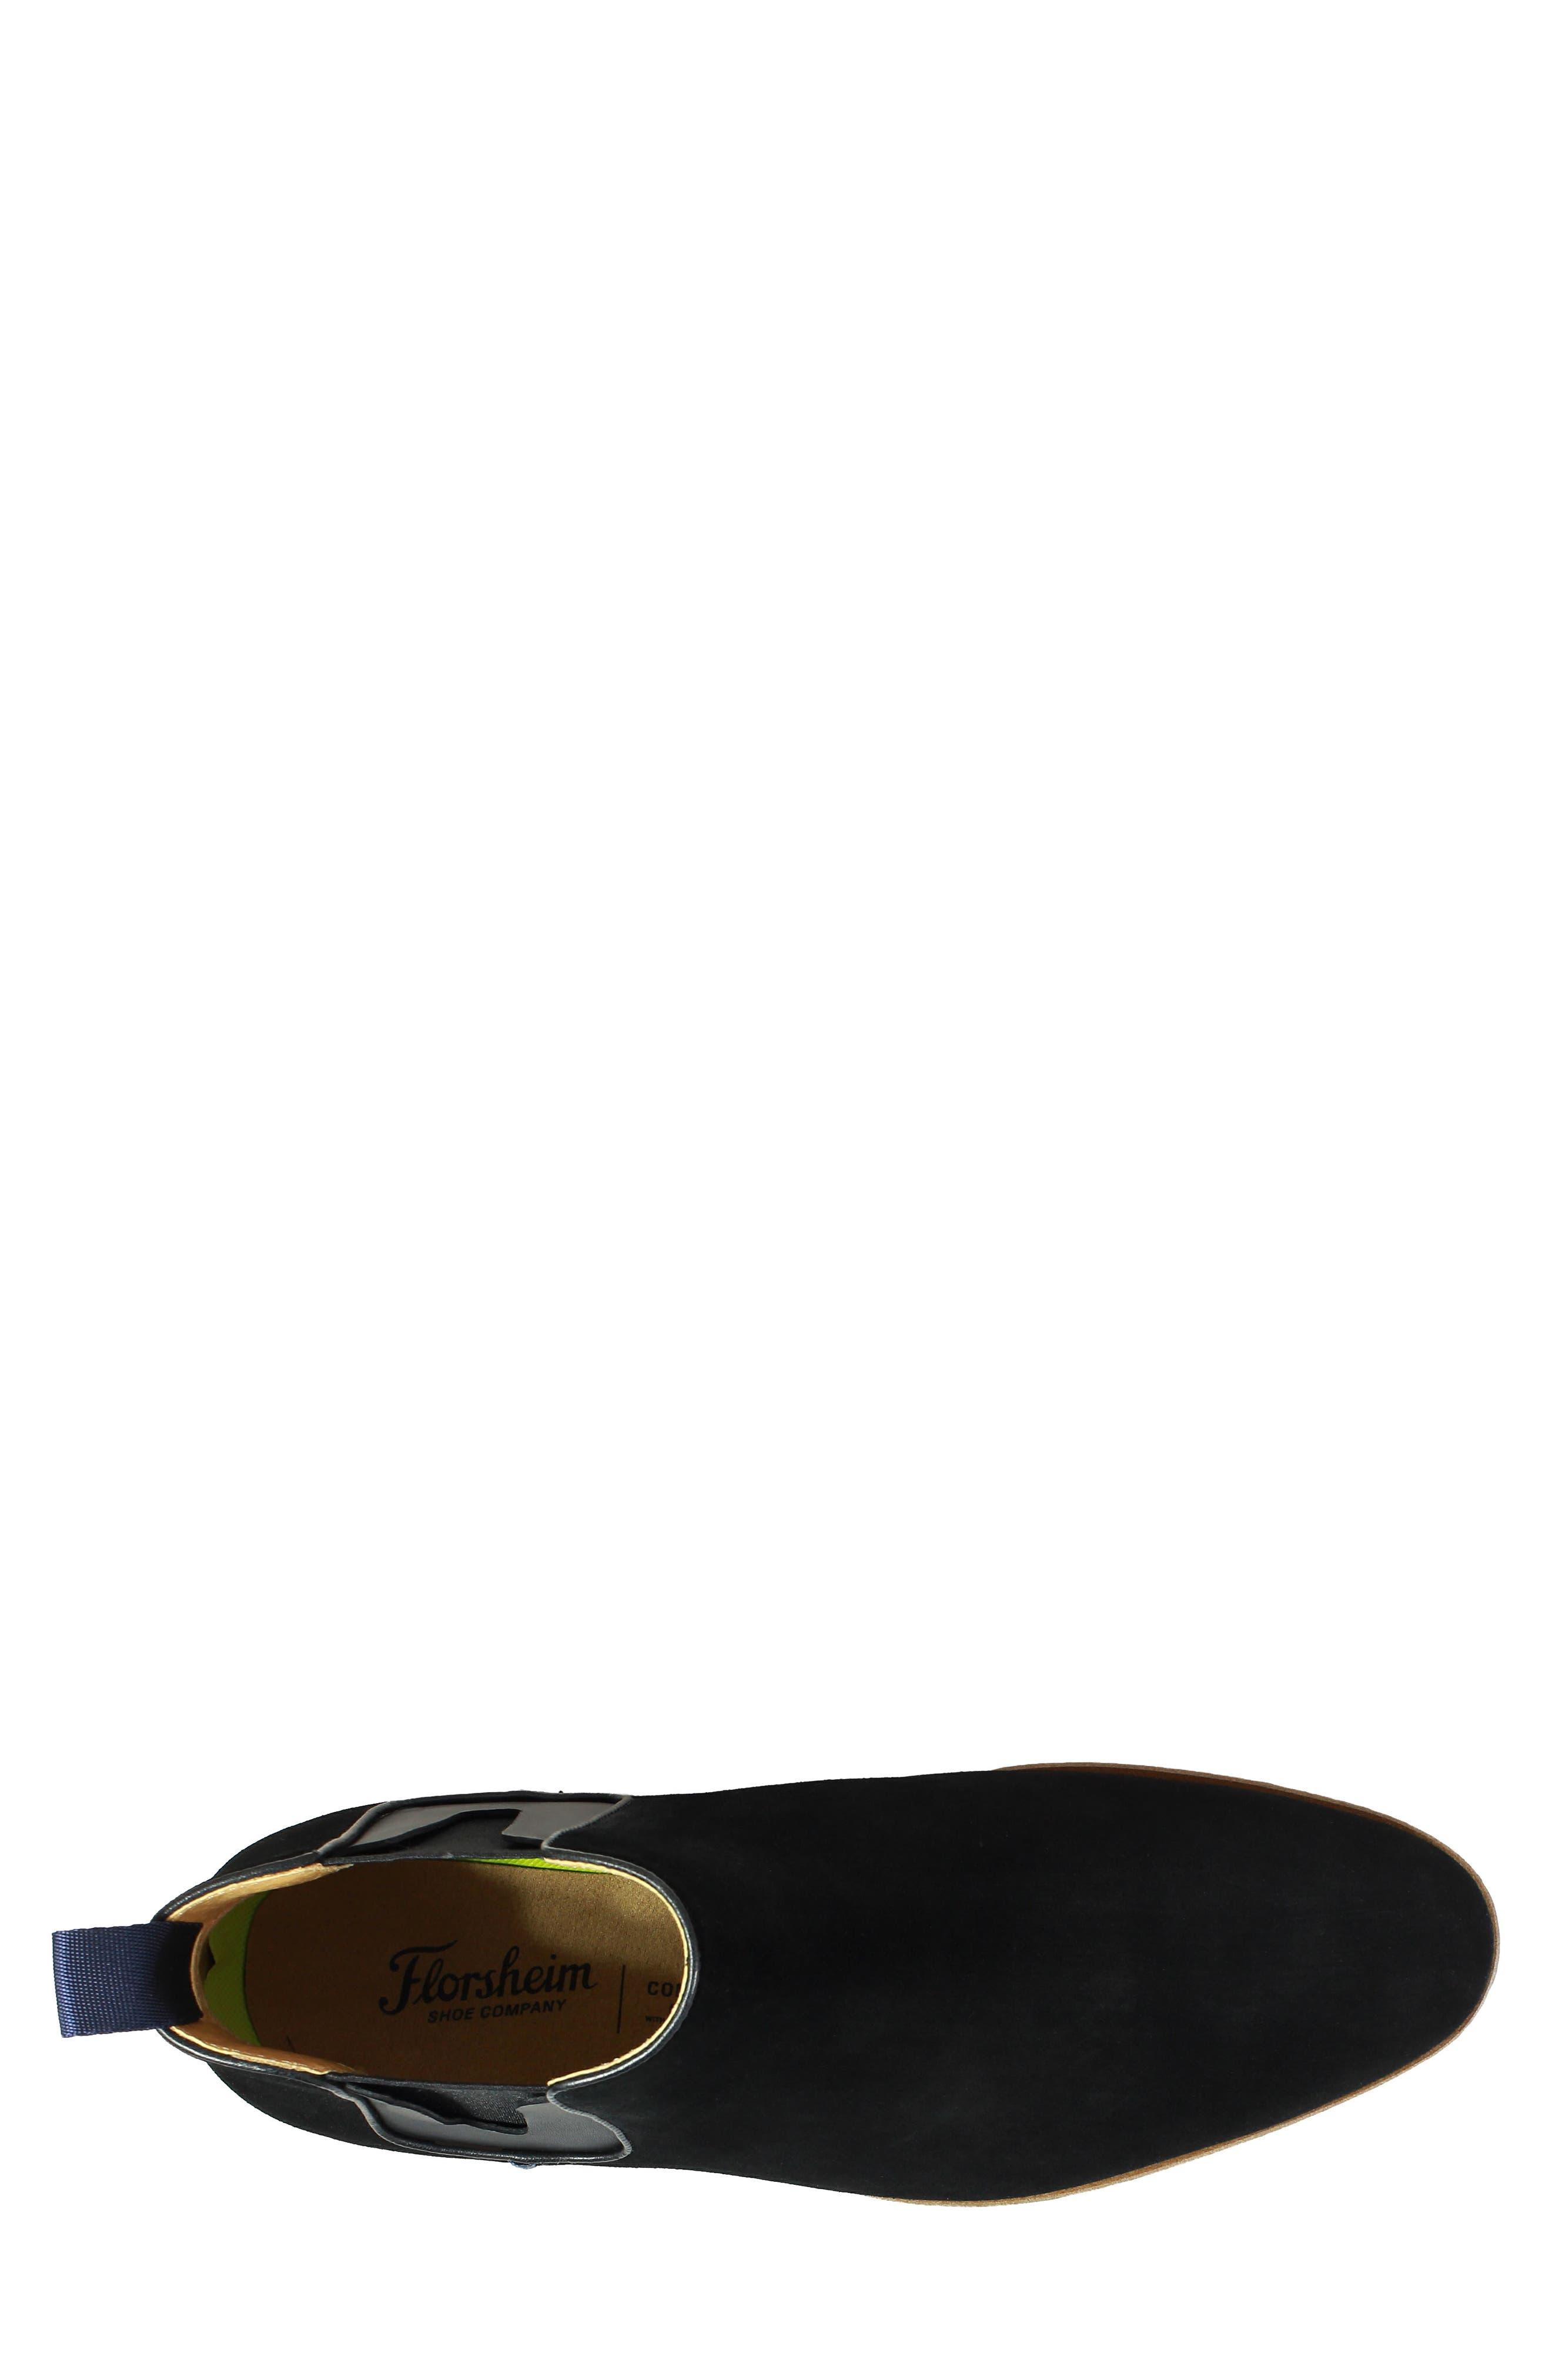 Uptown Plain Toe Mid Chelsea Boot,                             Alternate thumbnail 5, color,                             BLACK SUEDE